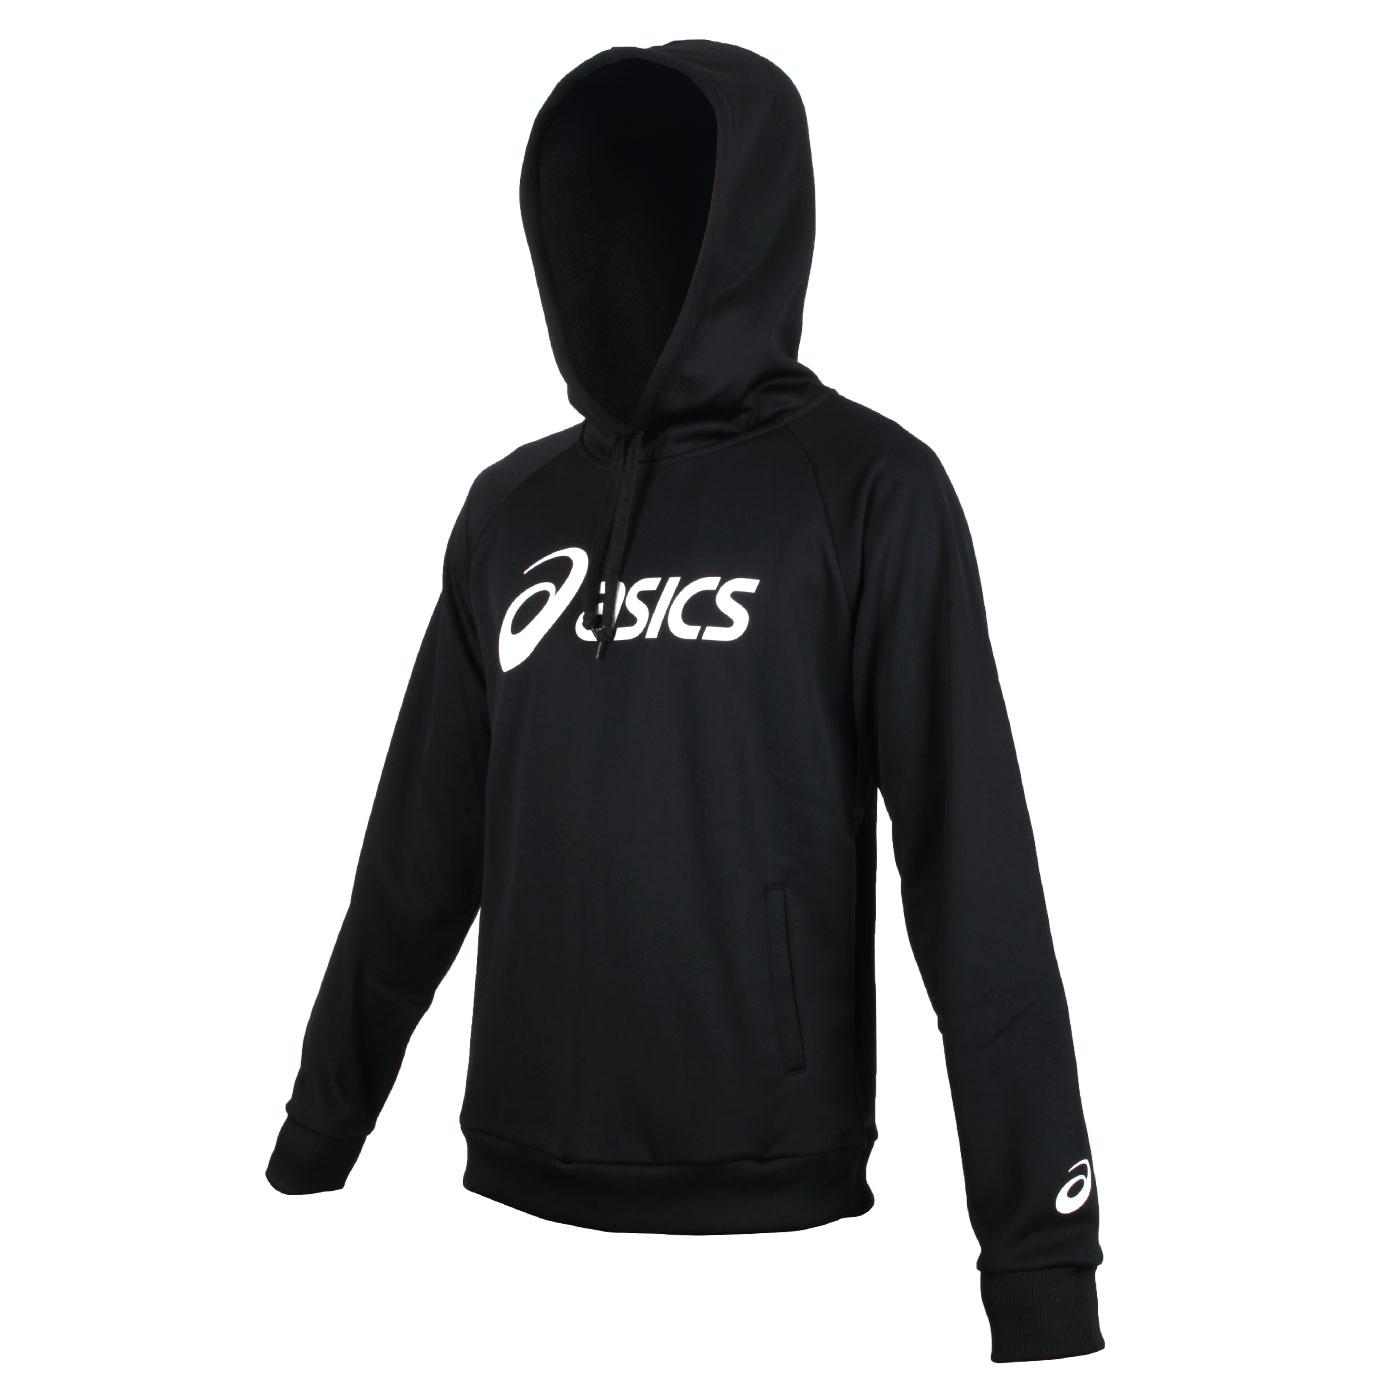 ASICS 長袖連帽T恤 K32014-50 - 黑白